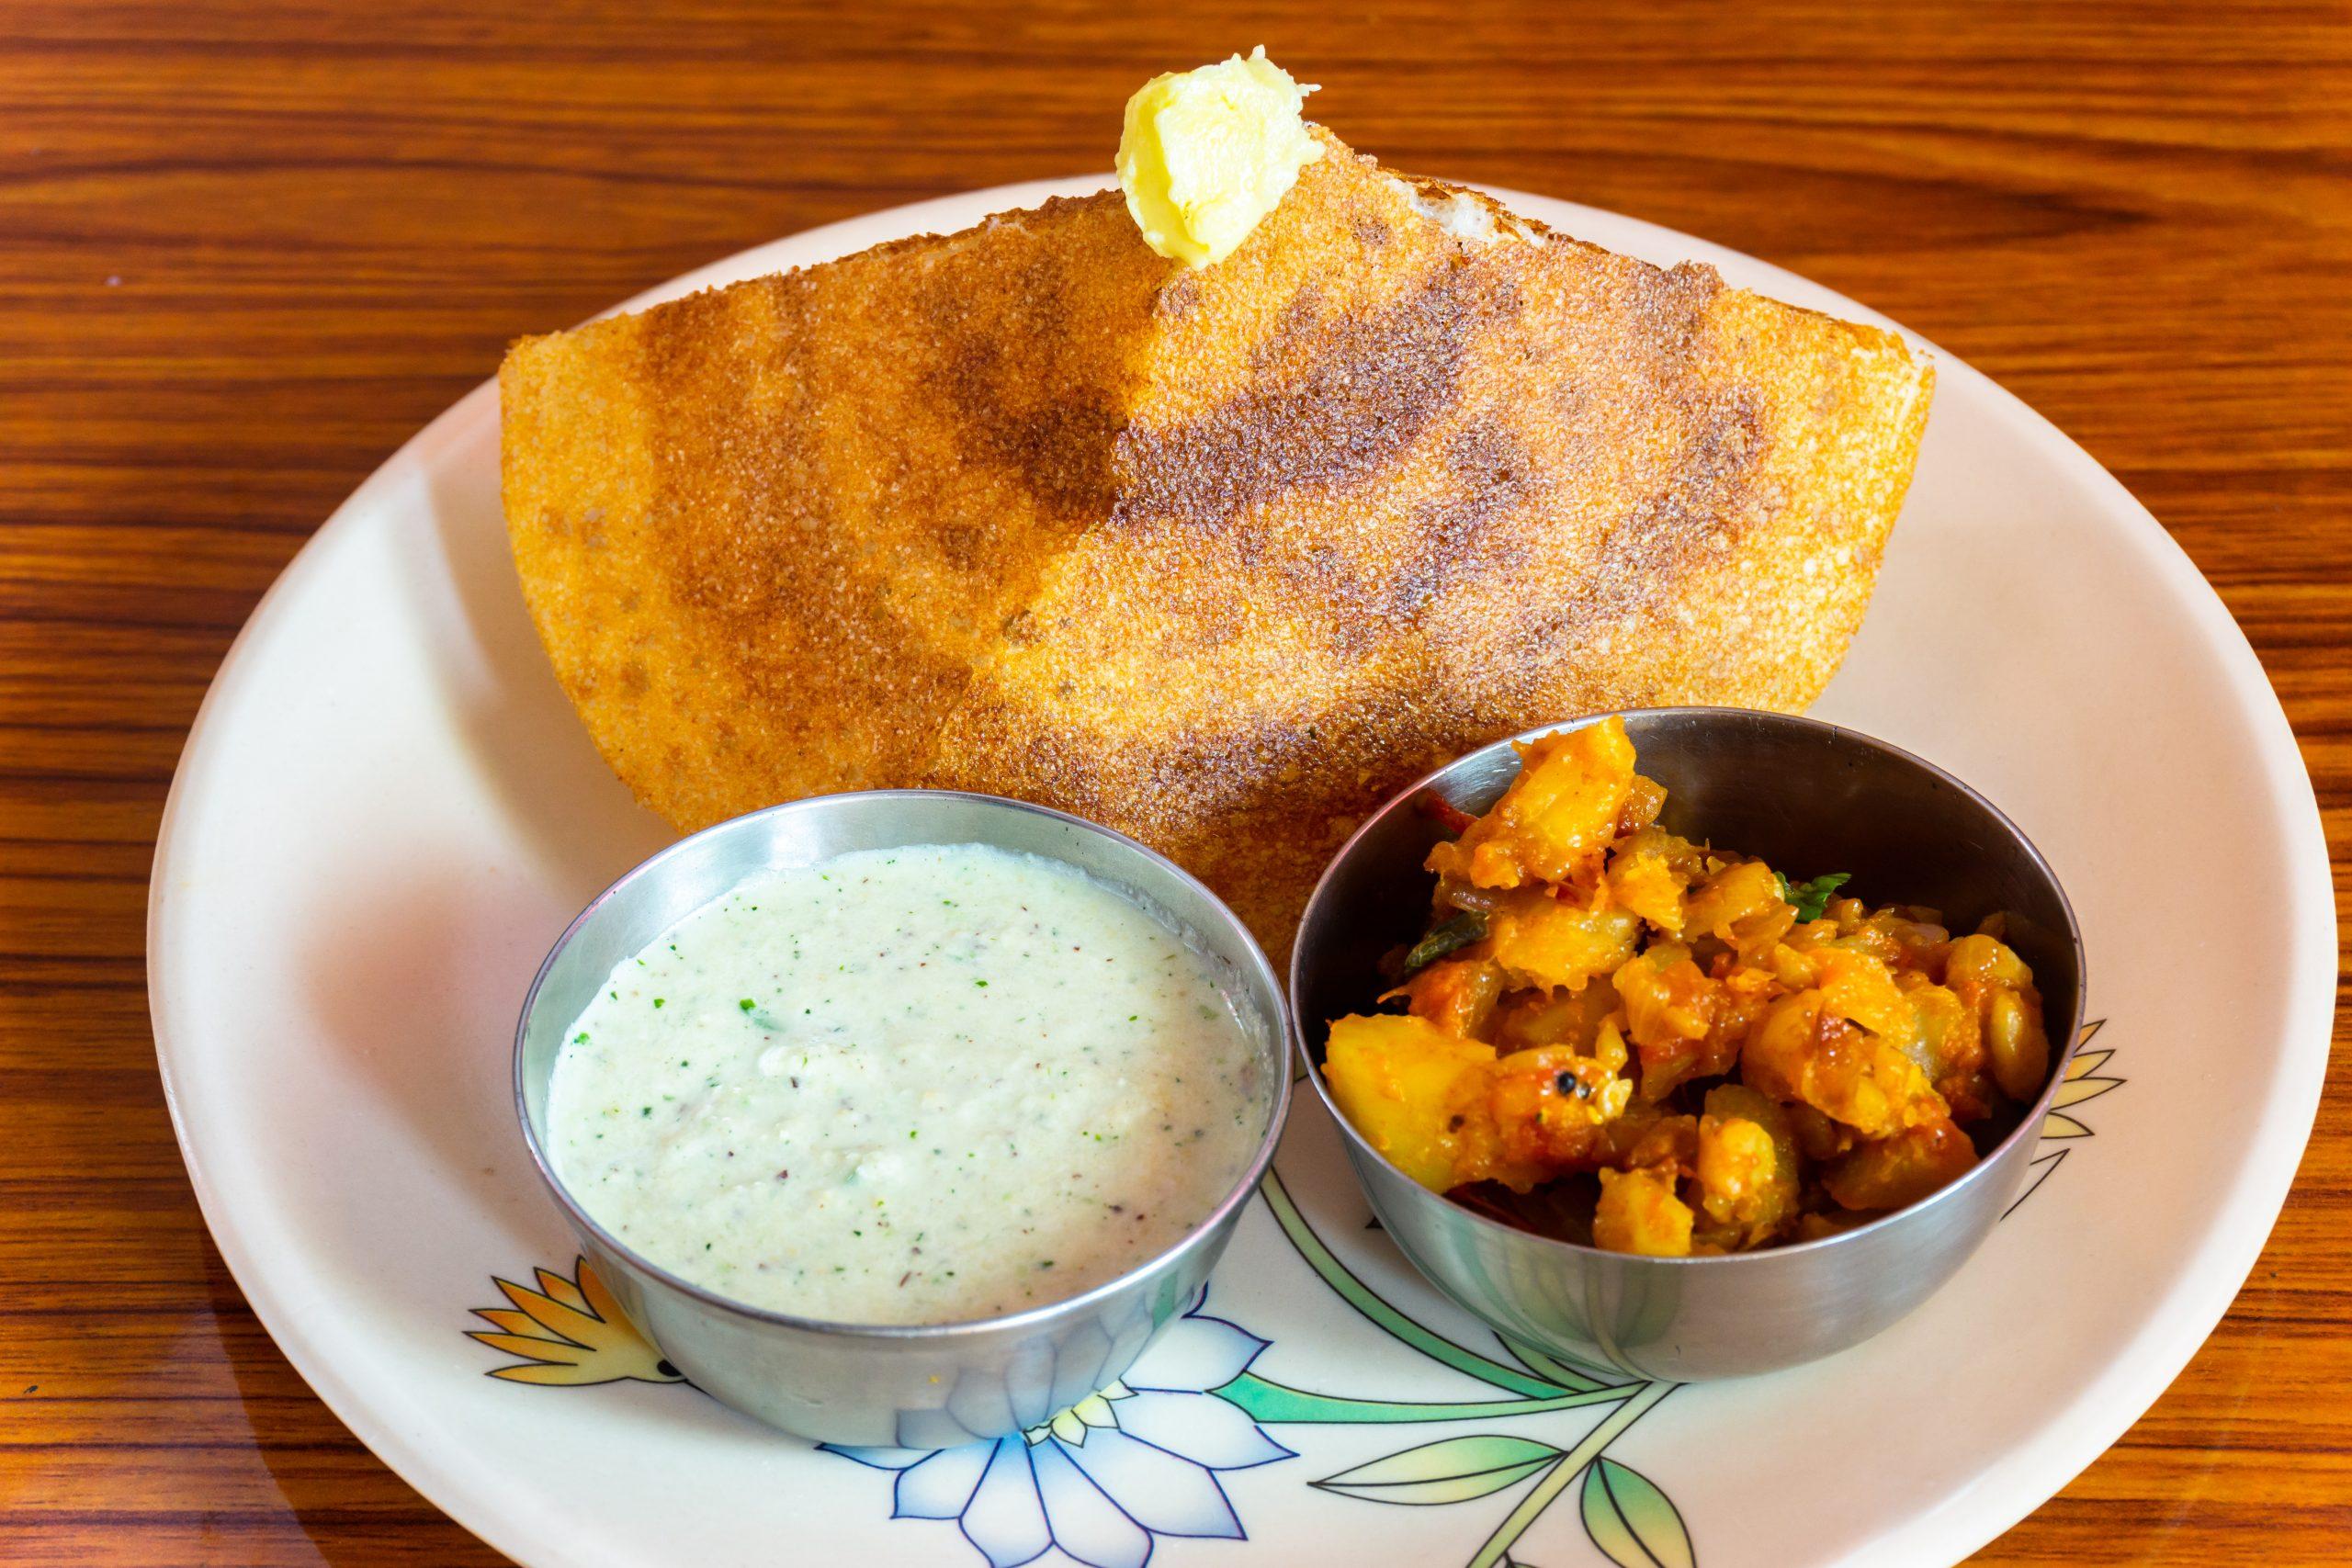 Masala dosa with potato